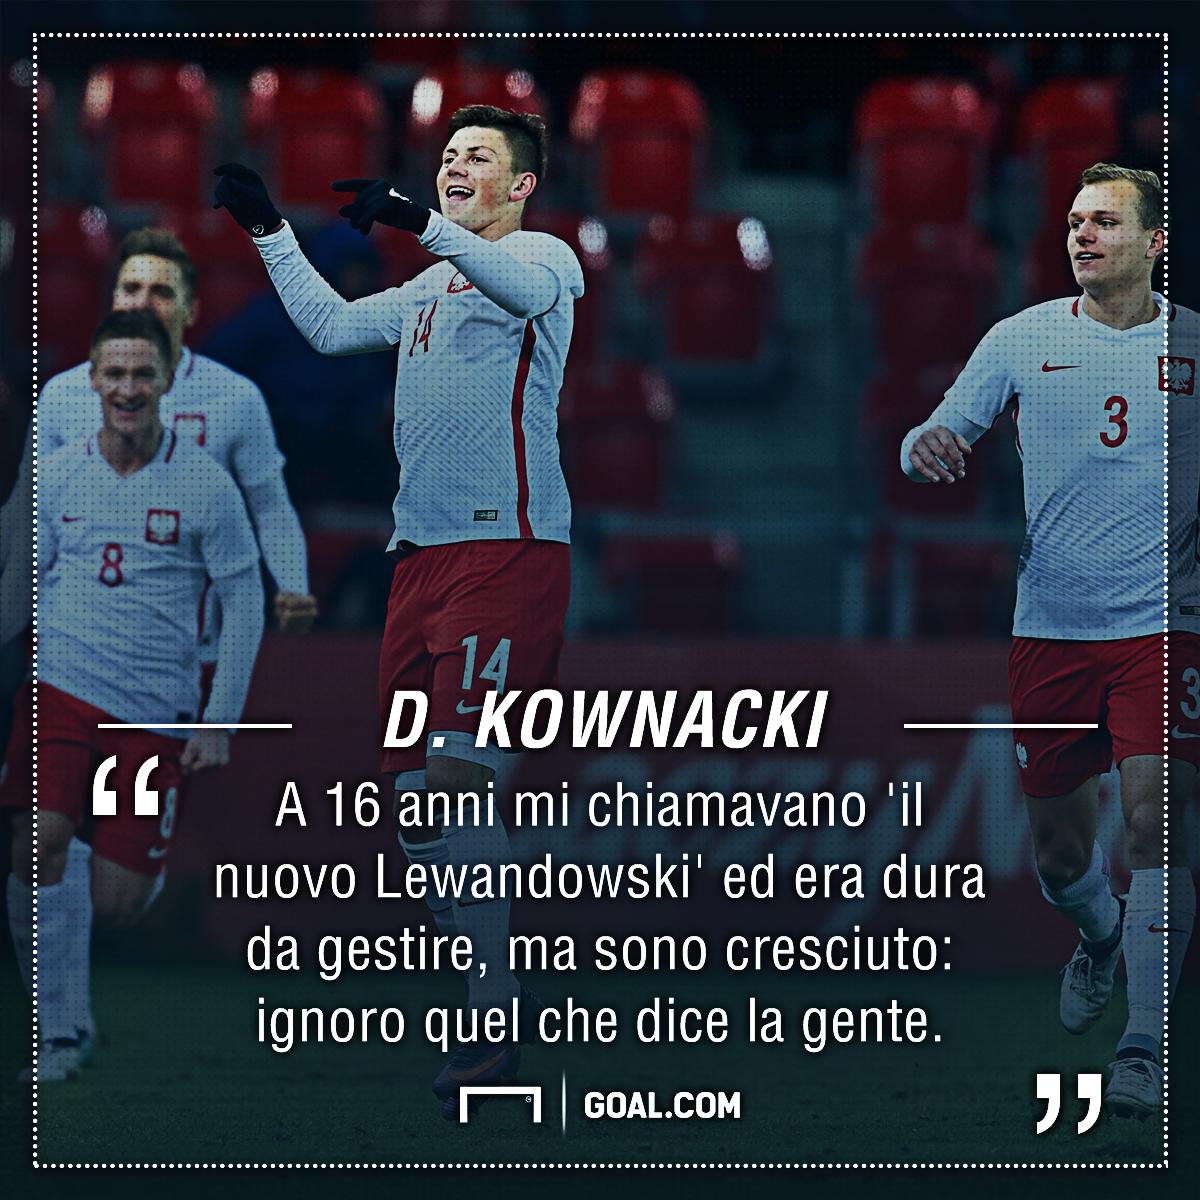 La Sampdoria scopre Kownacki: